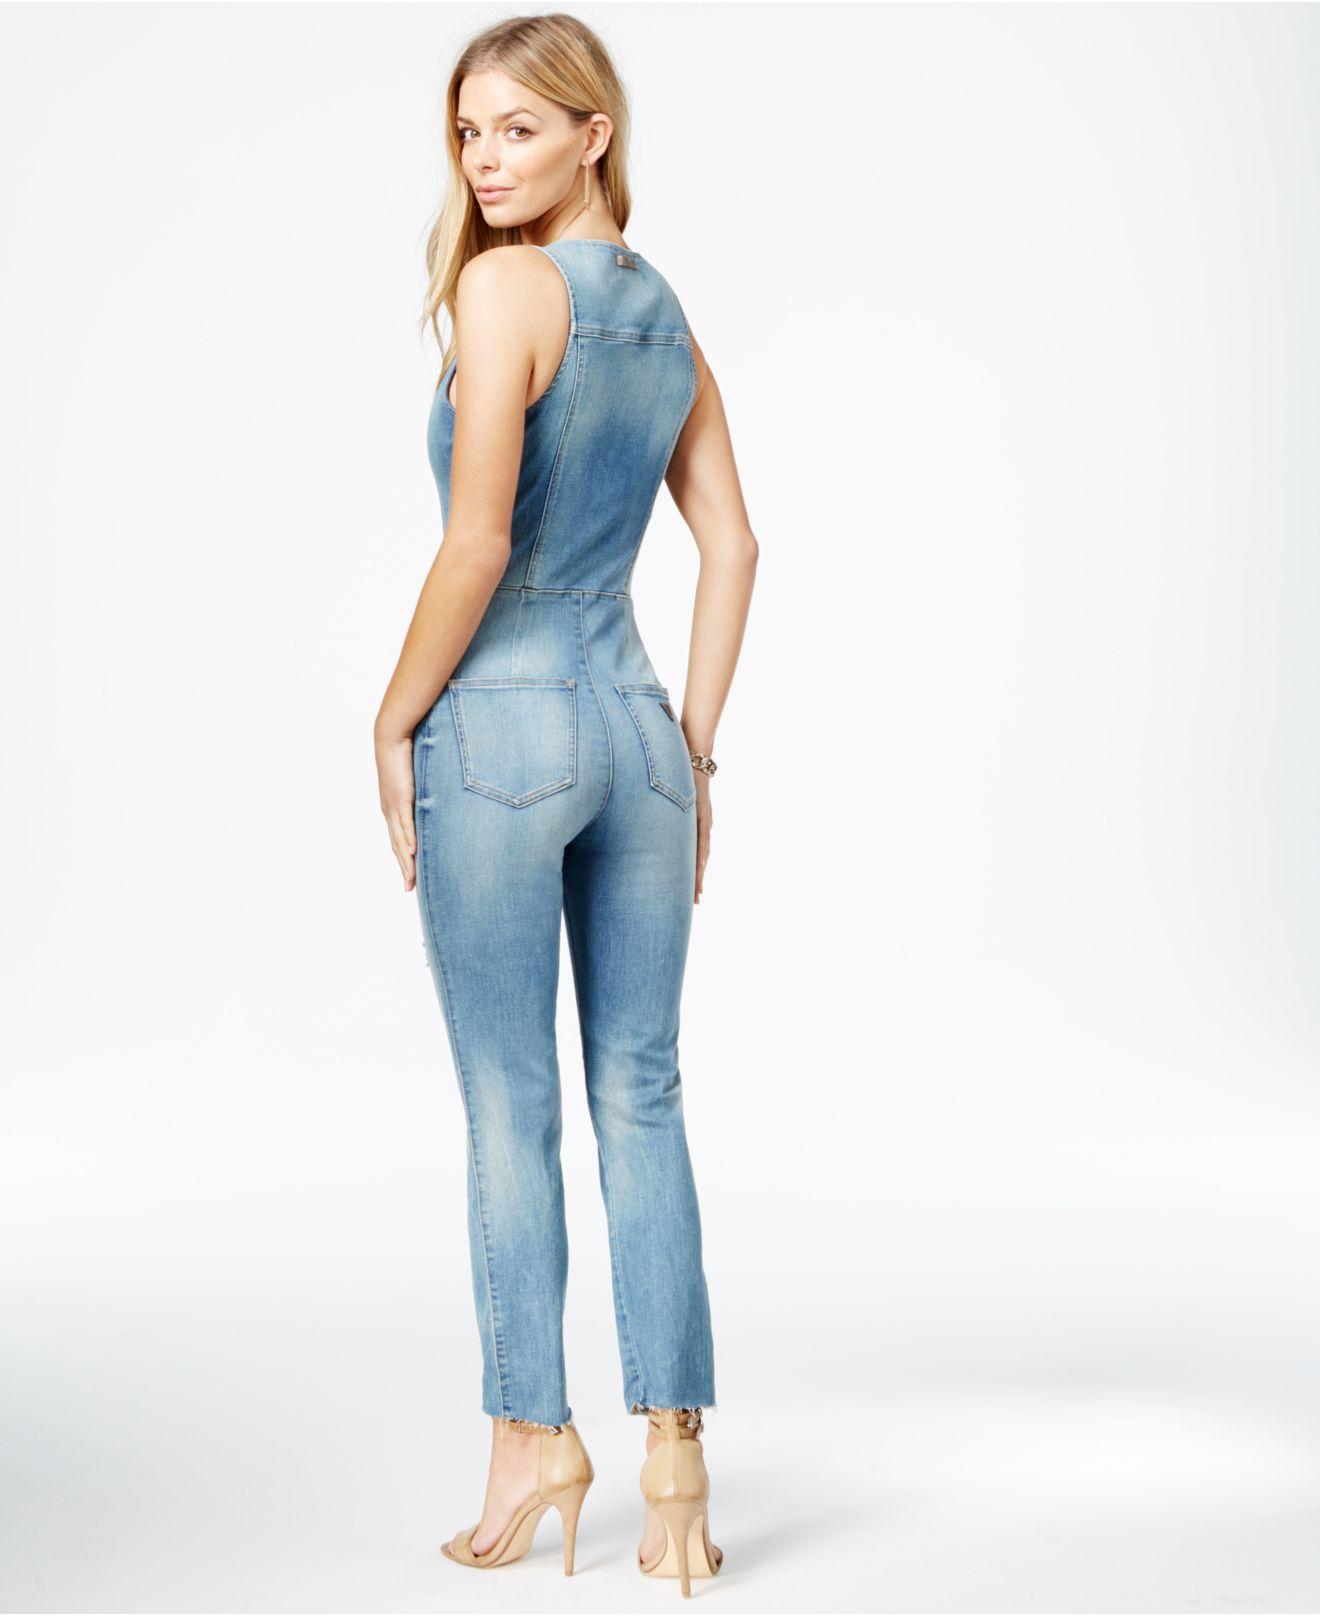 Lyst - Guess Chiara Ripped Denim Jumpsuit In Blue-8581